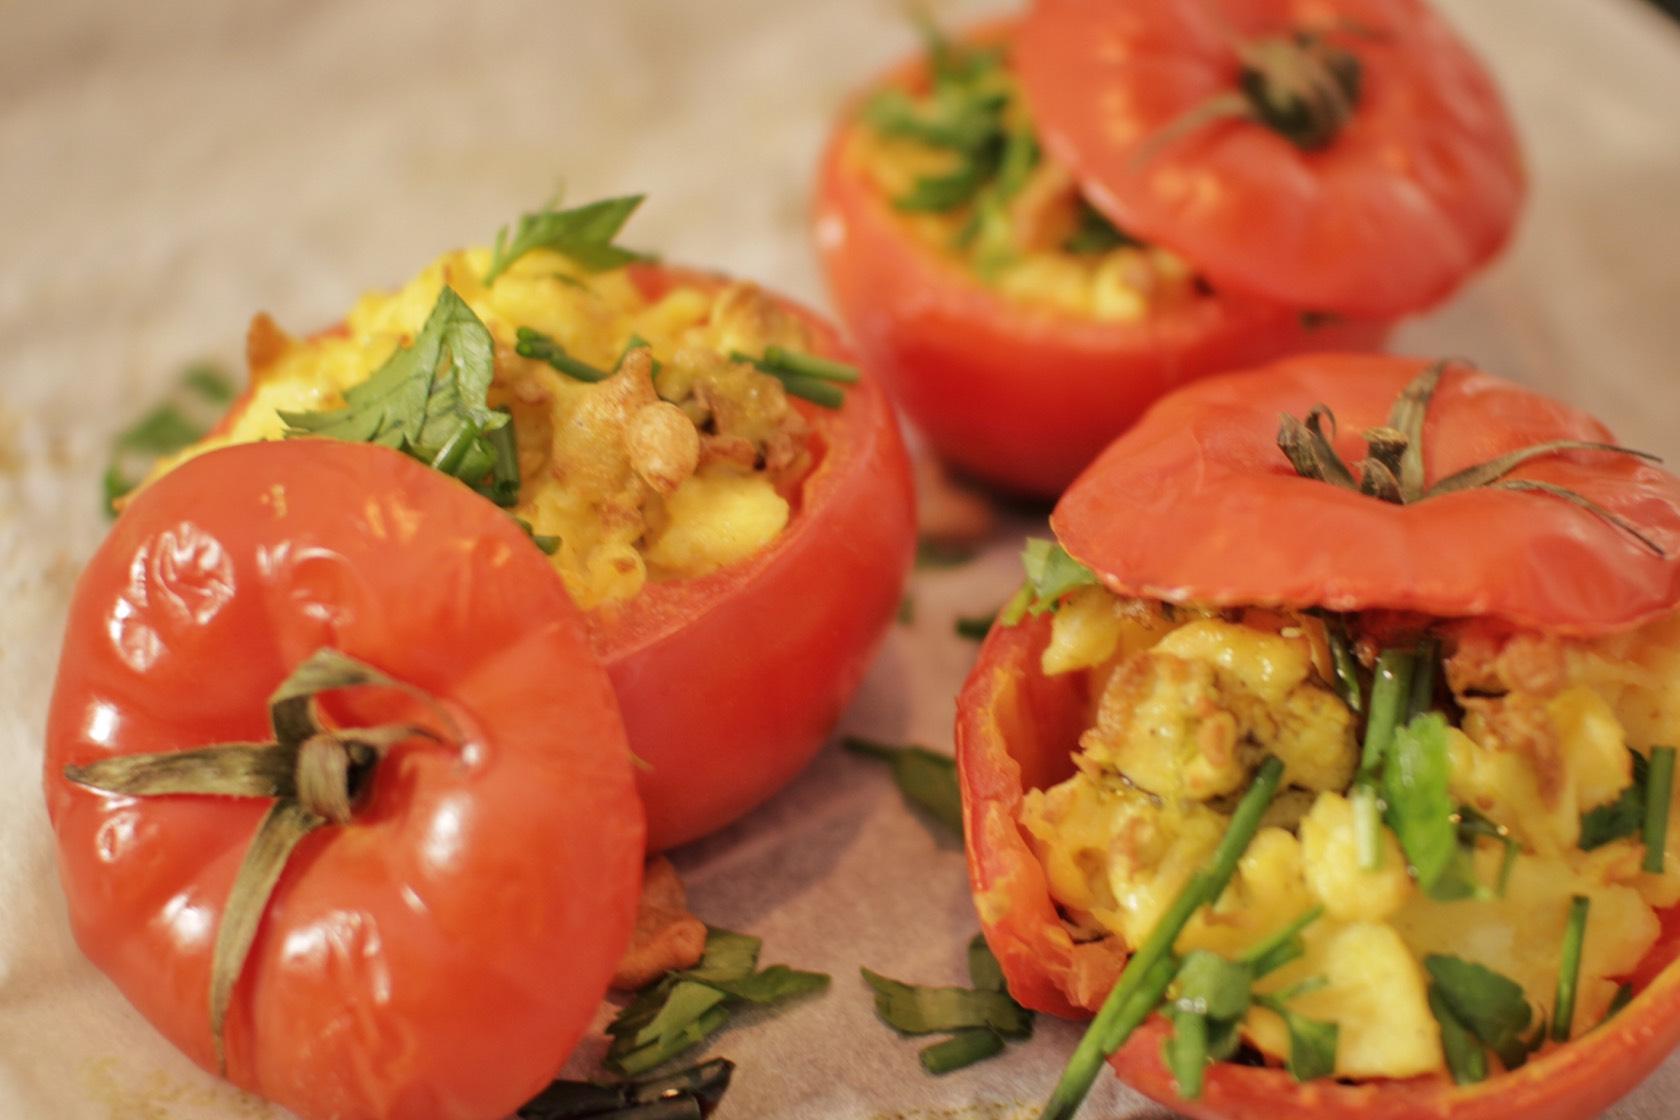 Gefüllte Tomaten mit Rührei